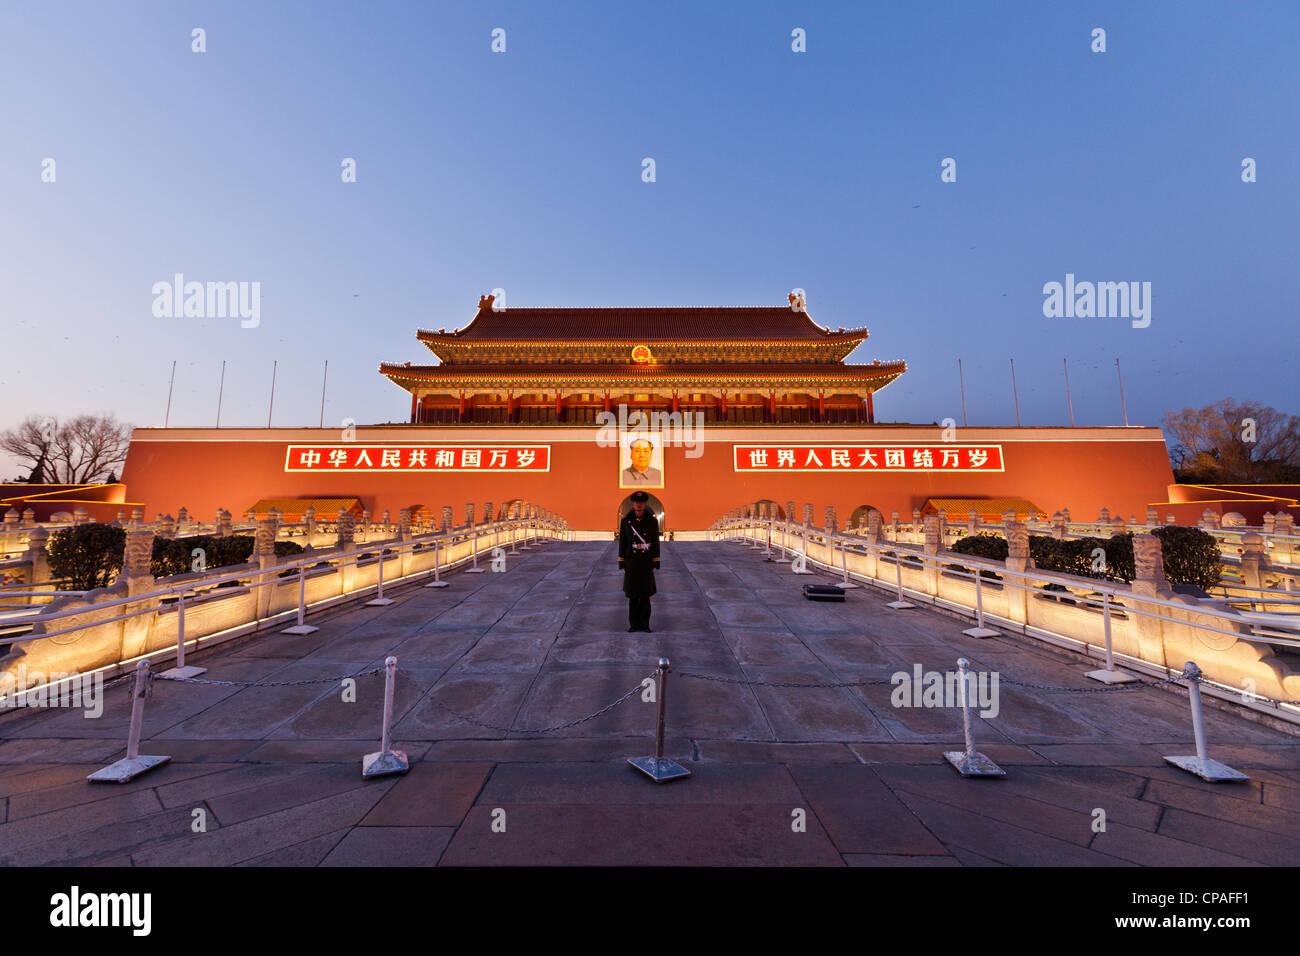 Tiananmen Gate, la Tha porte de la paix céleste, la Cité Interdite, Pékin, Chine Photo Stock